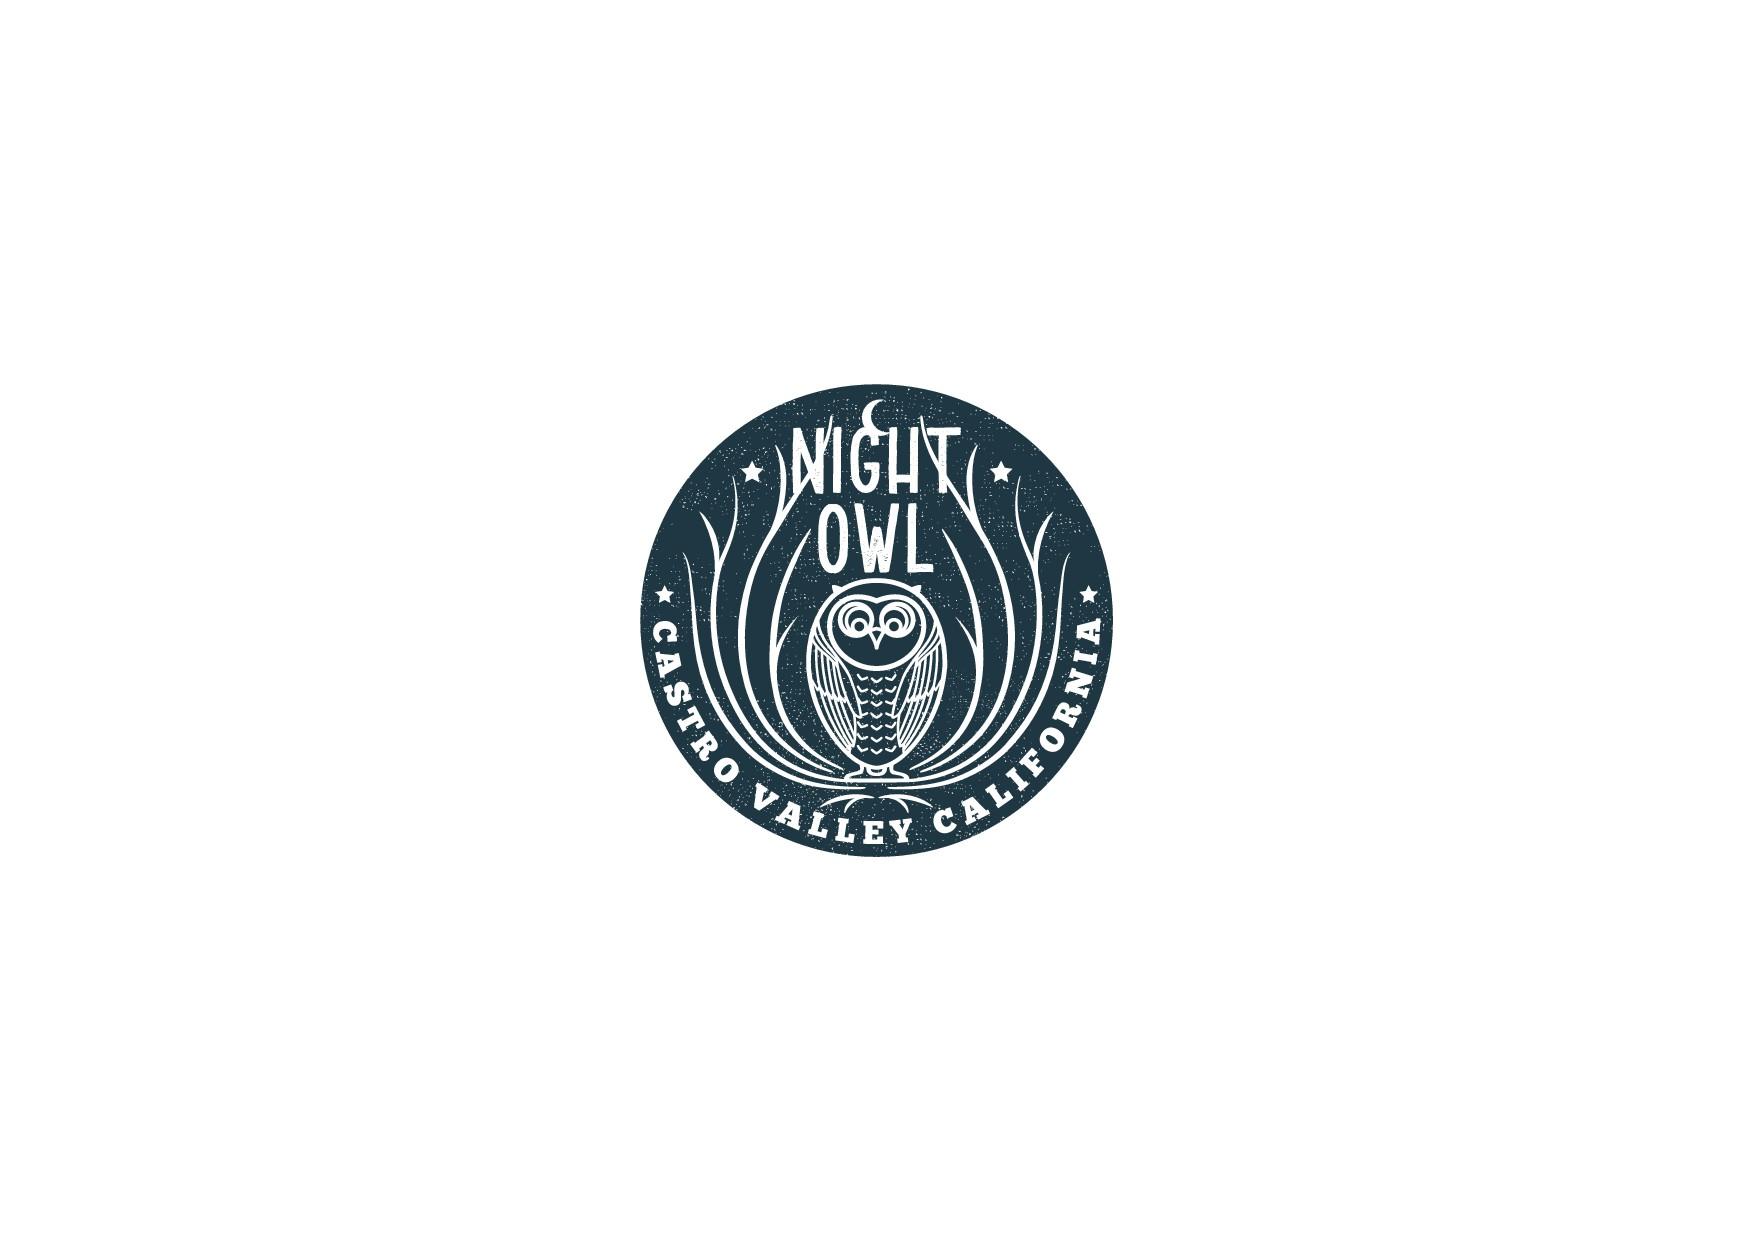 Night Owl: New Speakeasy Bar/Restaurant Needs Logo